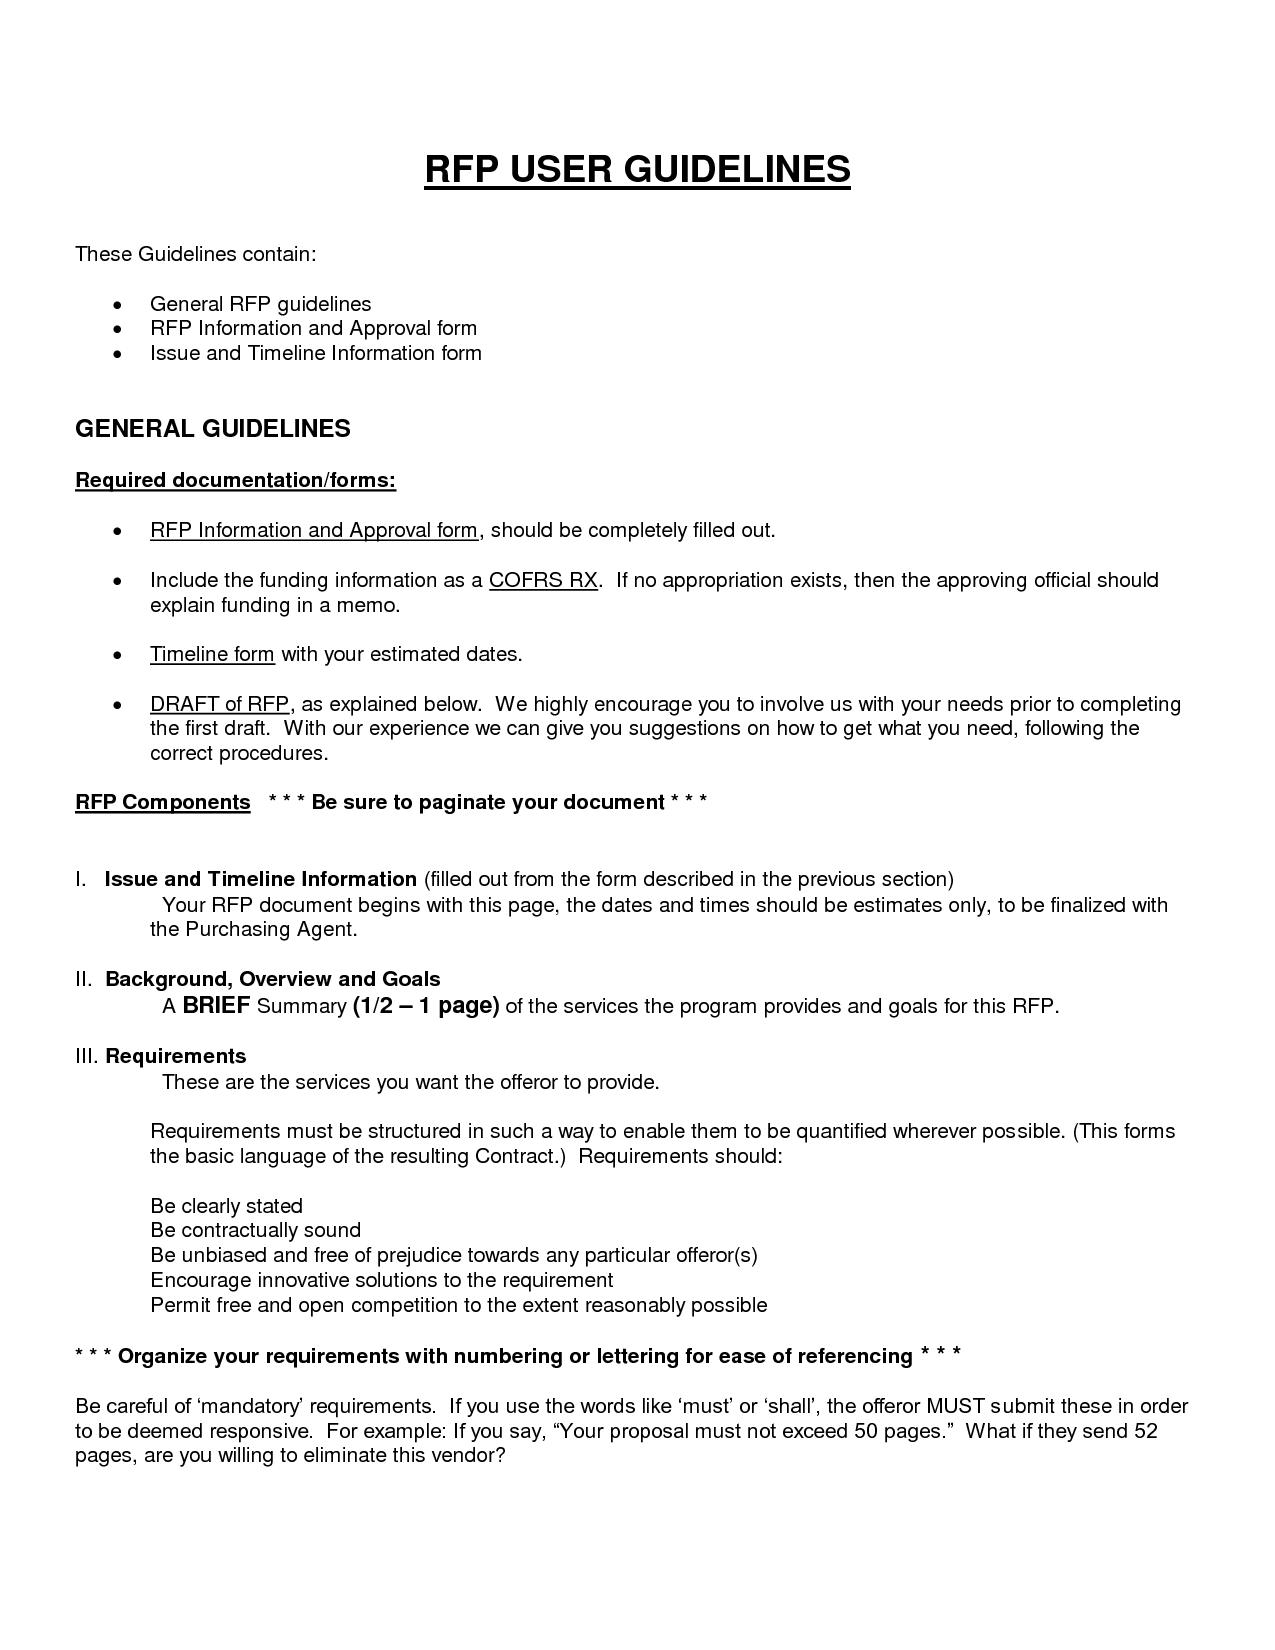 Business Proposal Sample Memo | Sample Job Application Letter